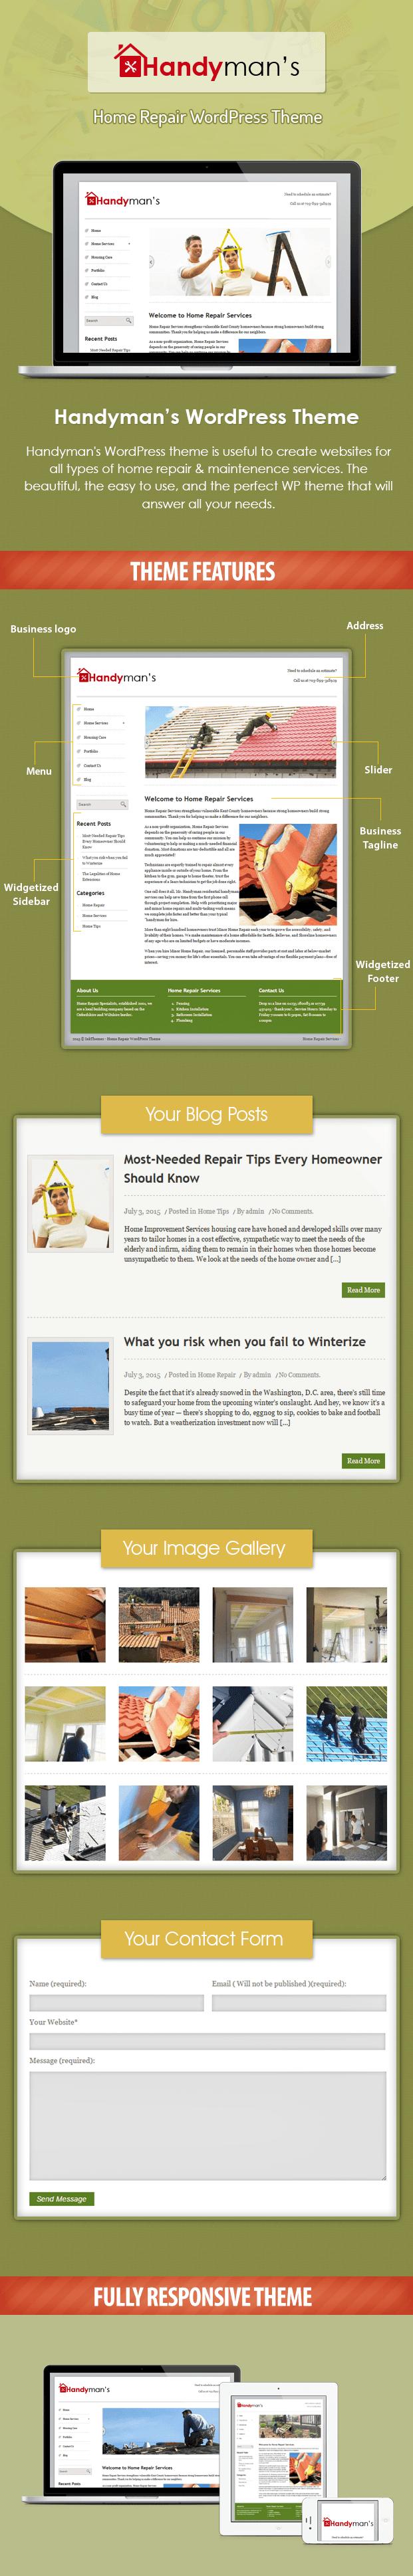 handyman - home repair and maintenence business wordpress theme